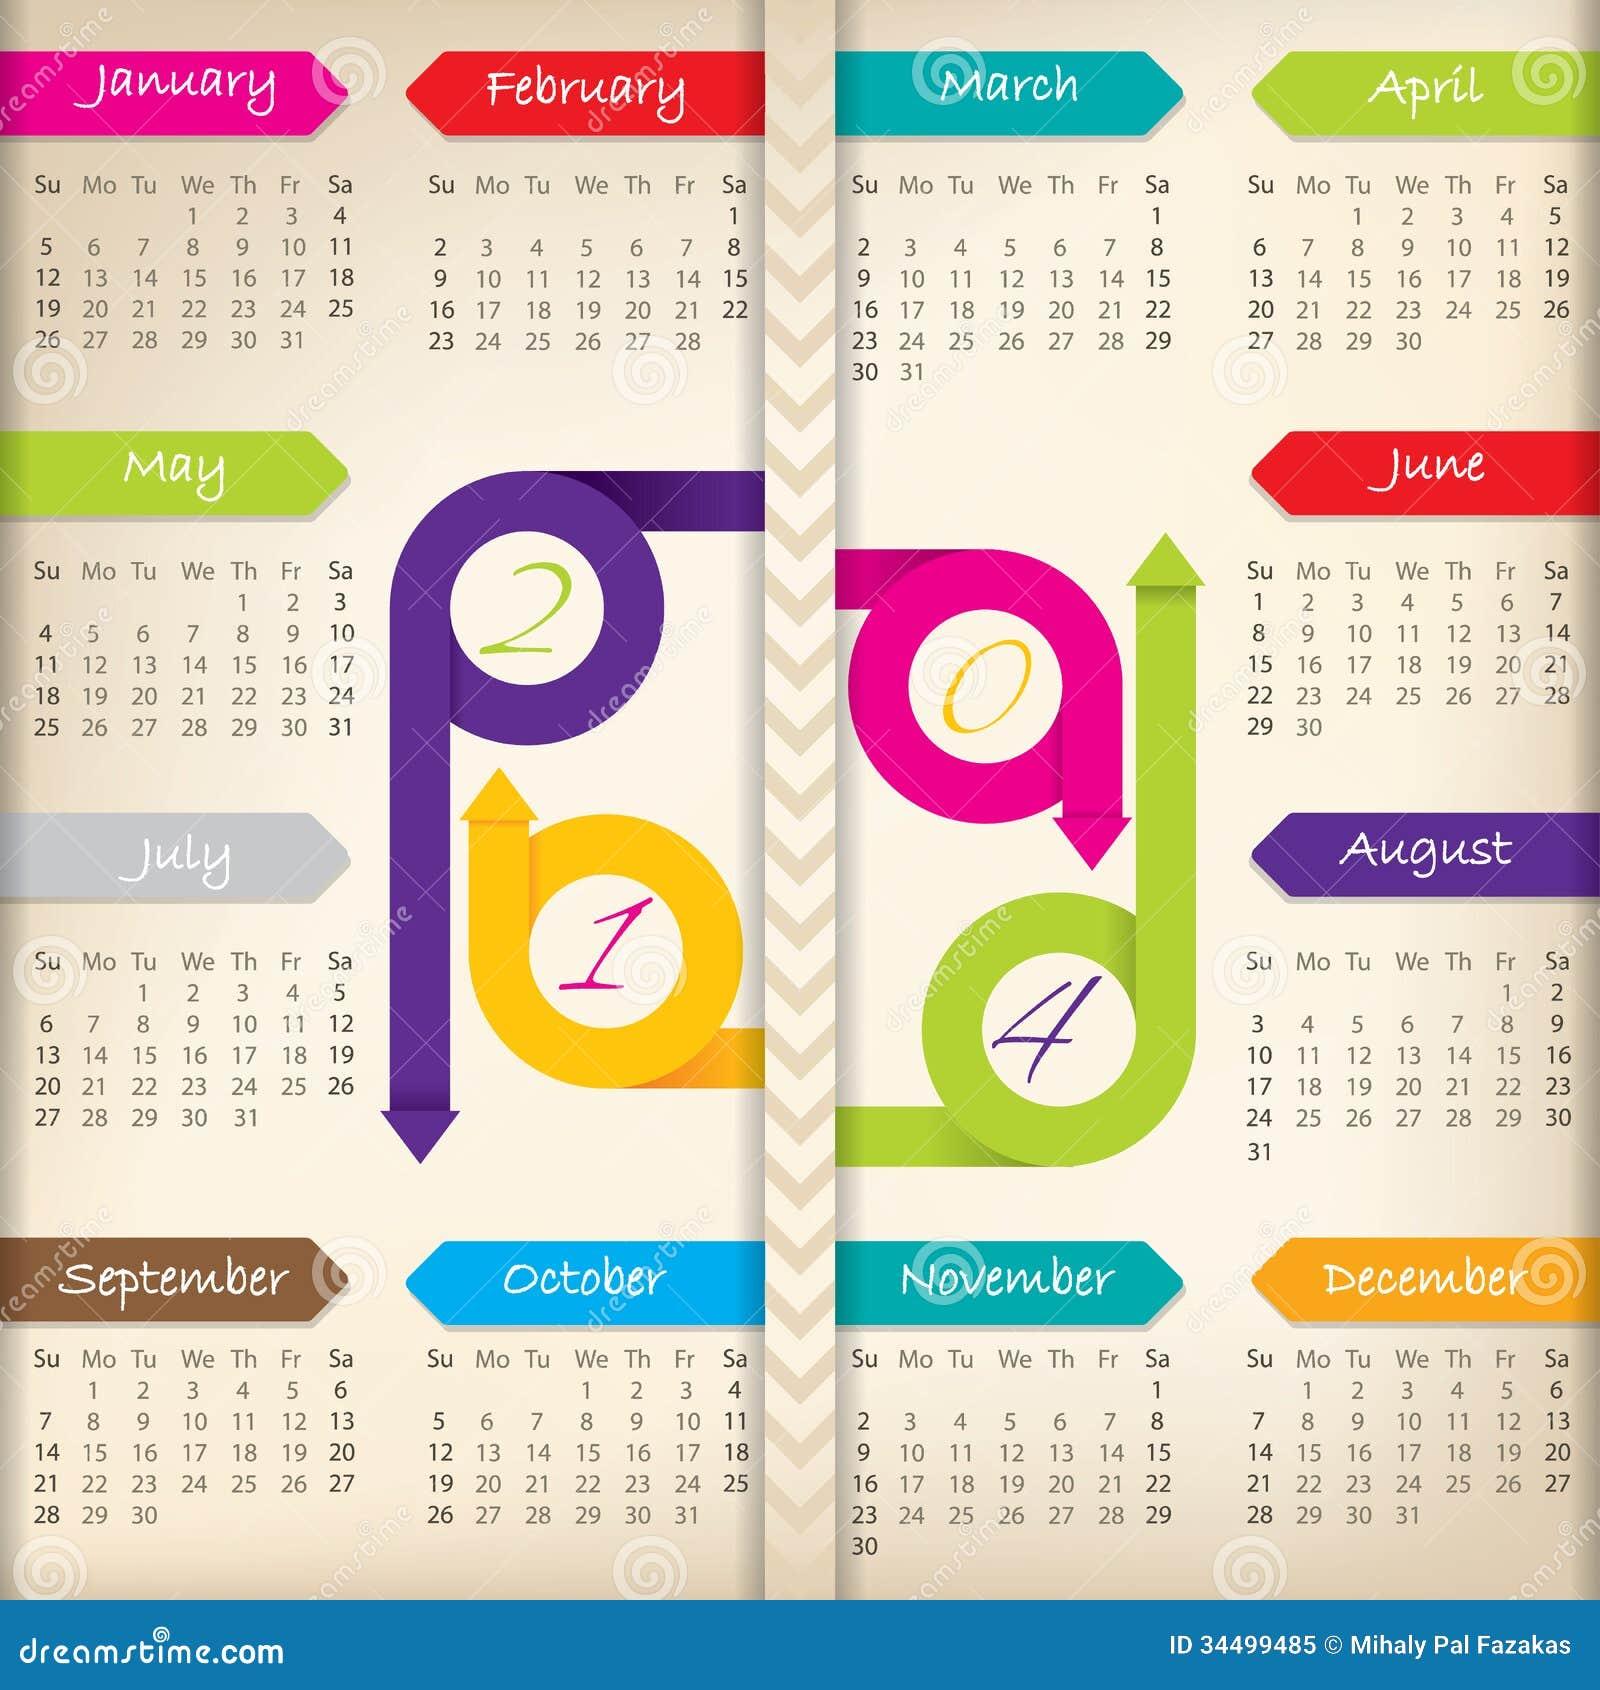 Calendar Ribbon Design : Calendar with color arrow ribbons royalty free stock